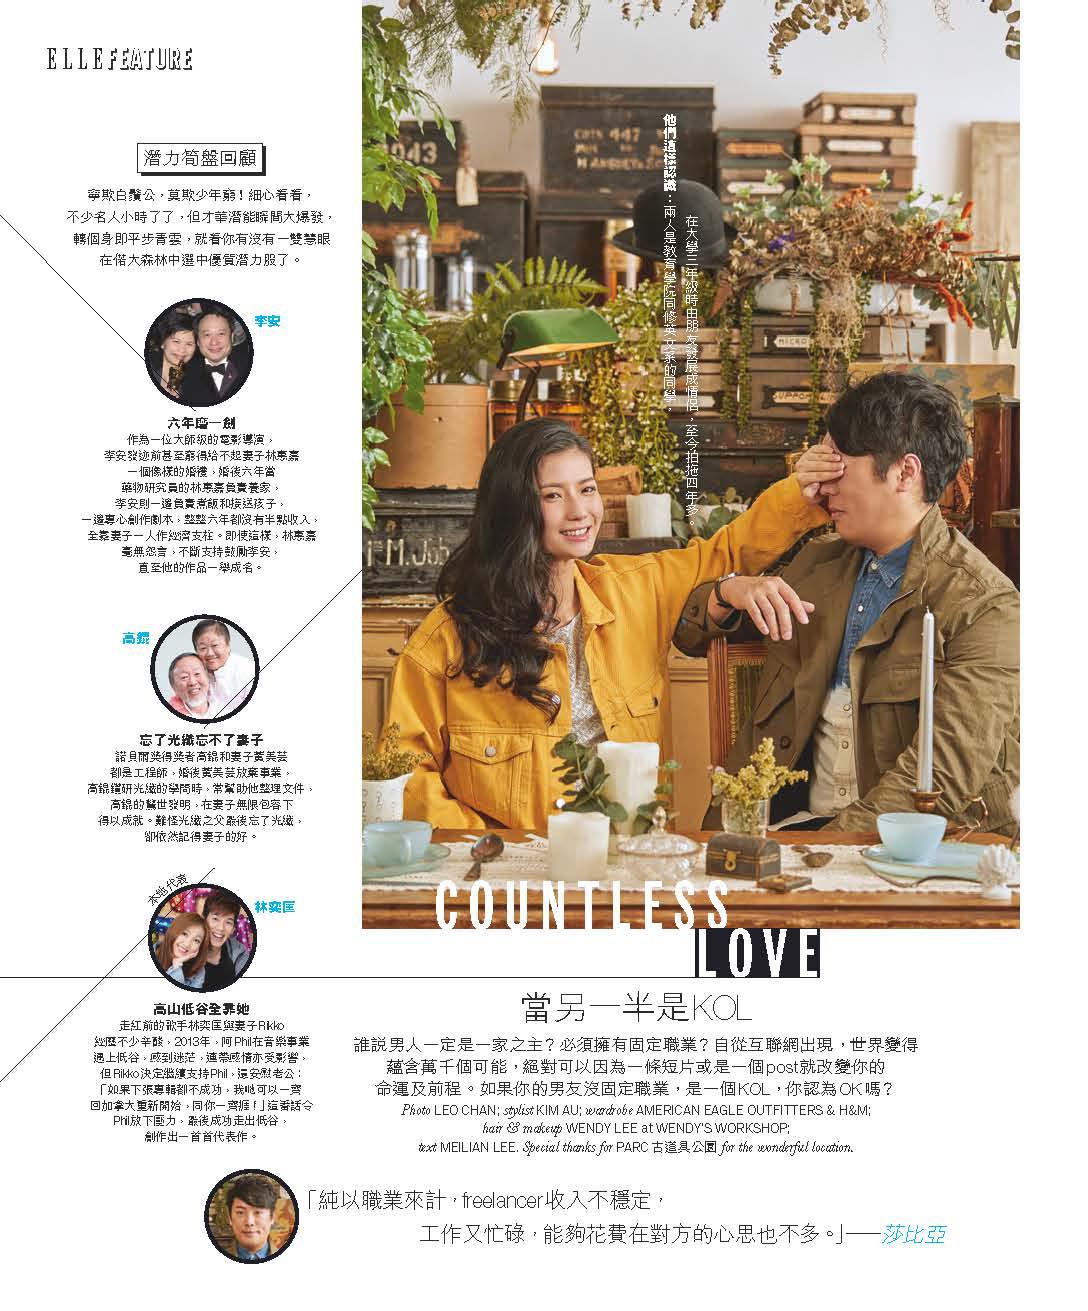 ELLE_April 2018366 Special_Page_3.jpg